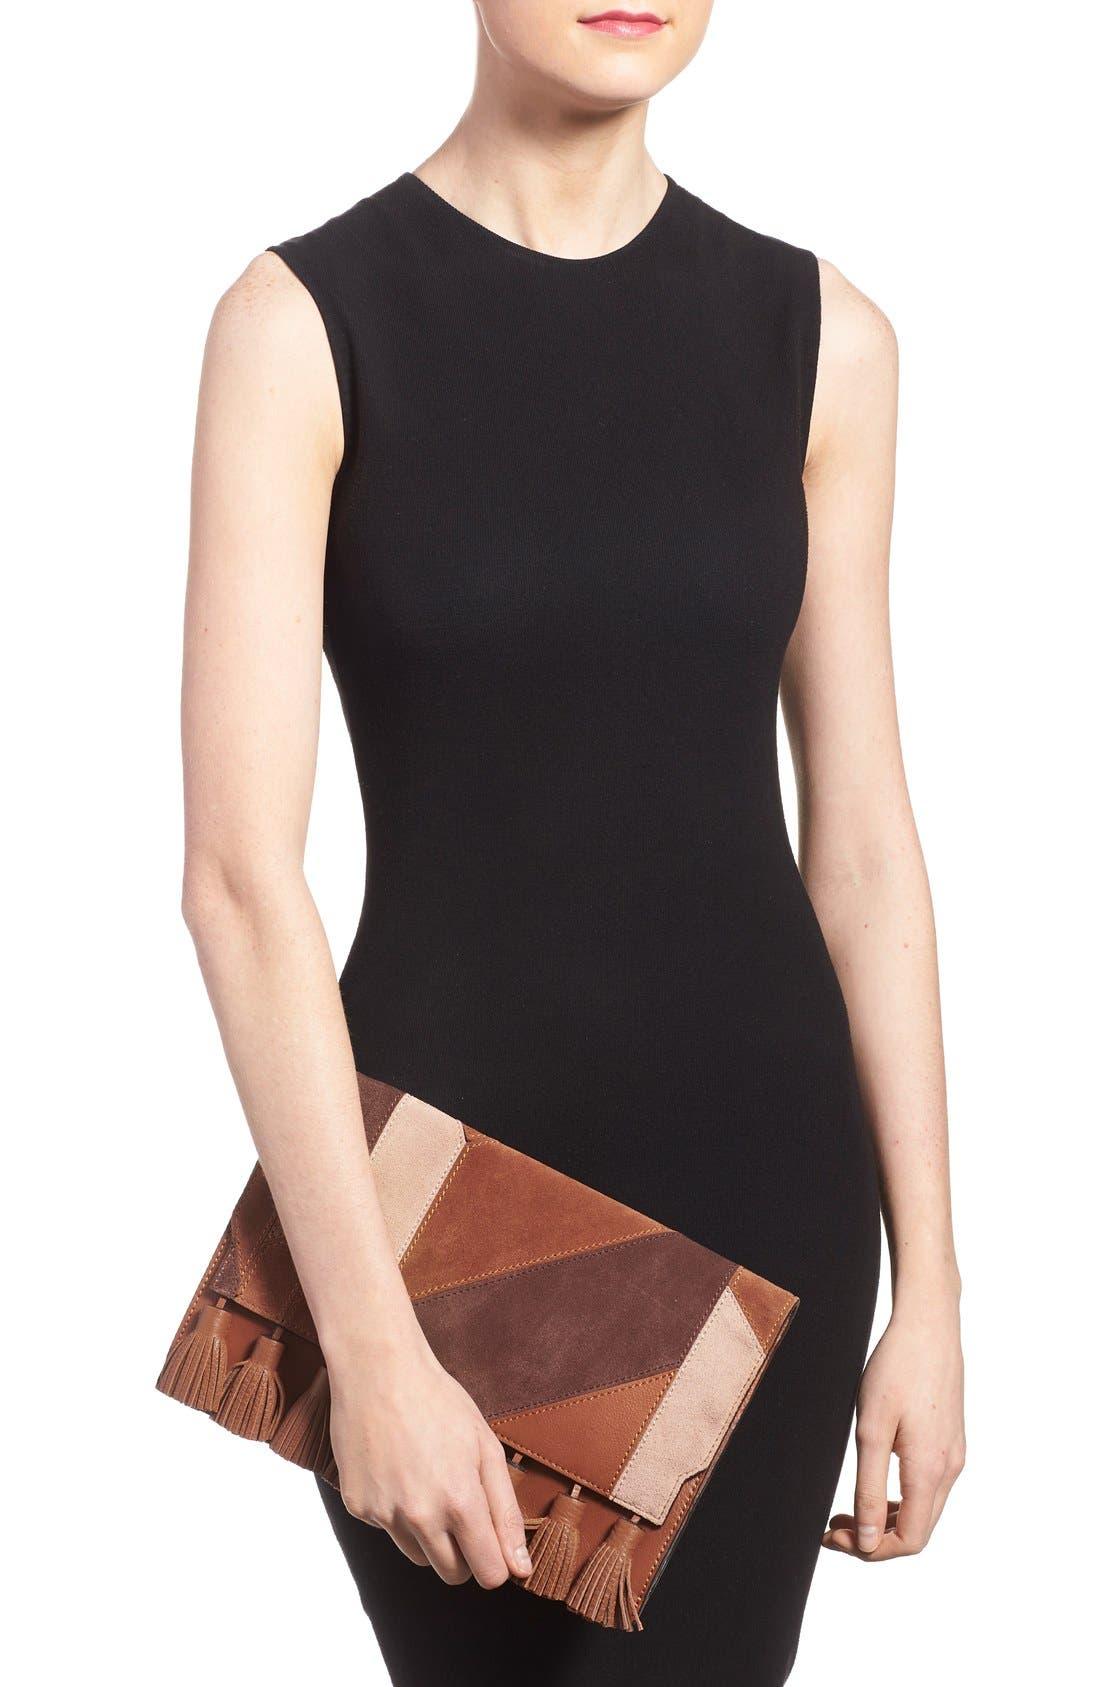 Alternate Image 2  - Rebecca Minkoff 'Sofia' Tassel Patchwork Leather Clutch